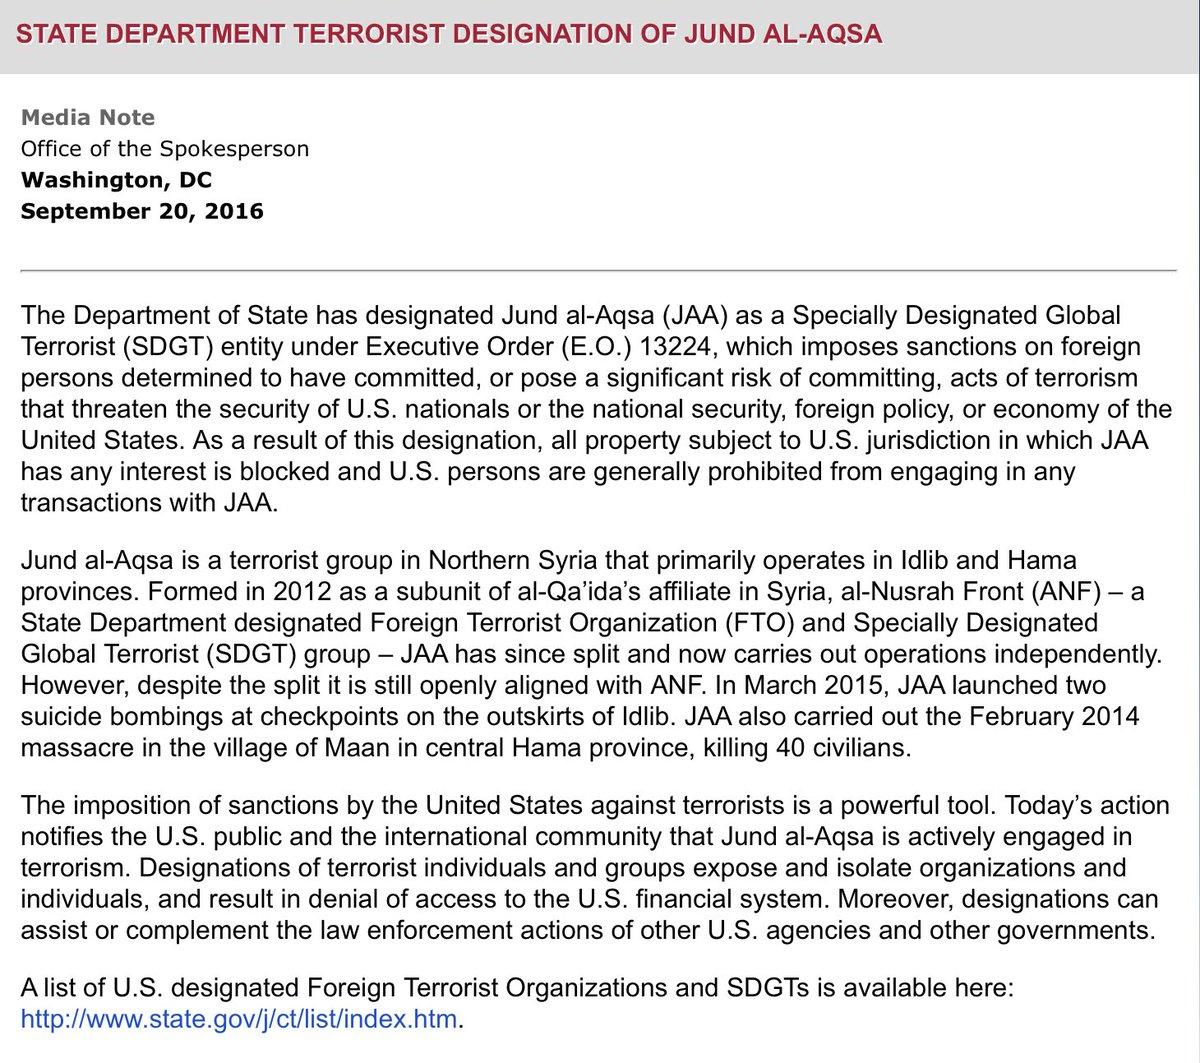 US Designates Jund al-Aqsa (Best friend of 'Moderate Opposition' in Hama Province) as Terrorist Entity